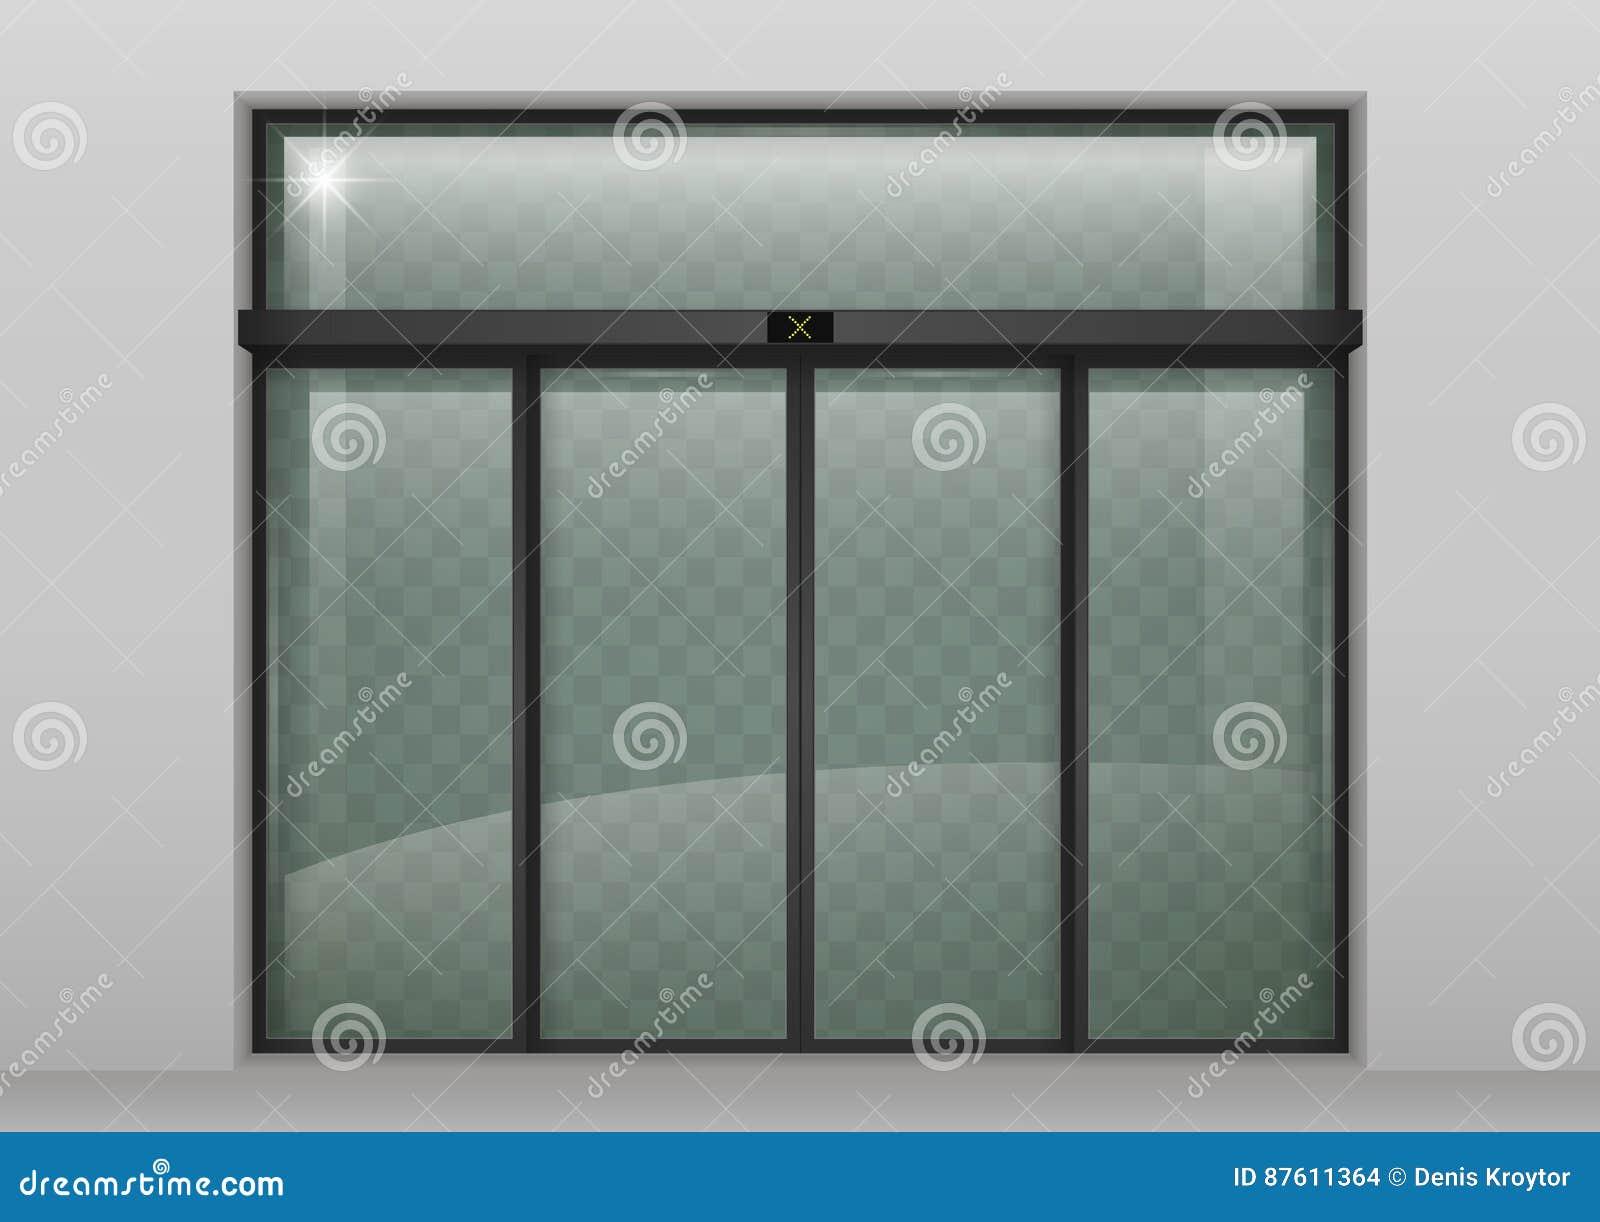 Sliding Glass Automatic Doors Stock Illustration Illustration Of